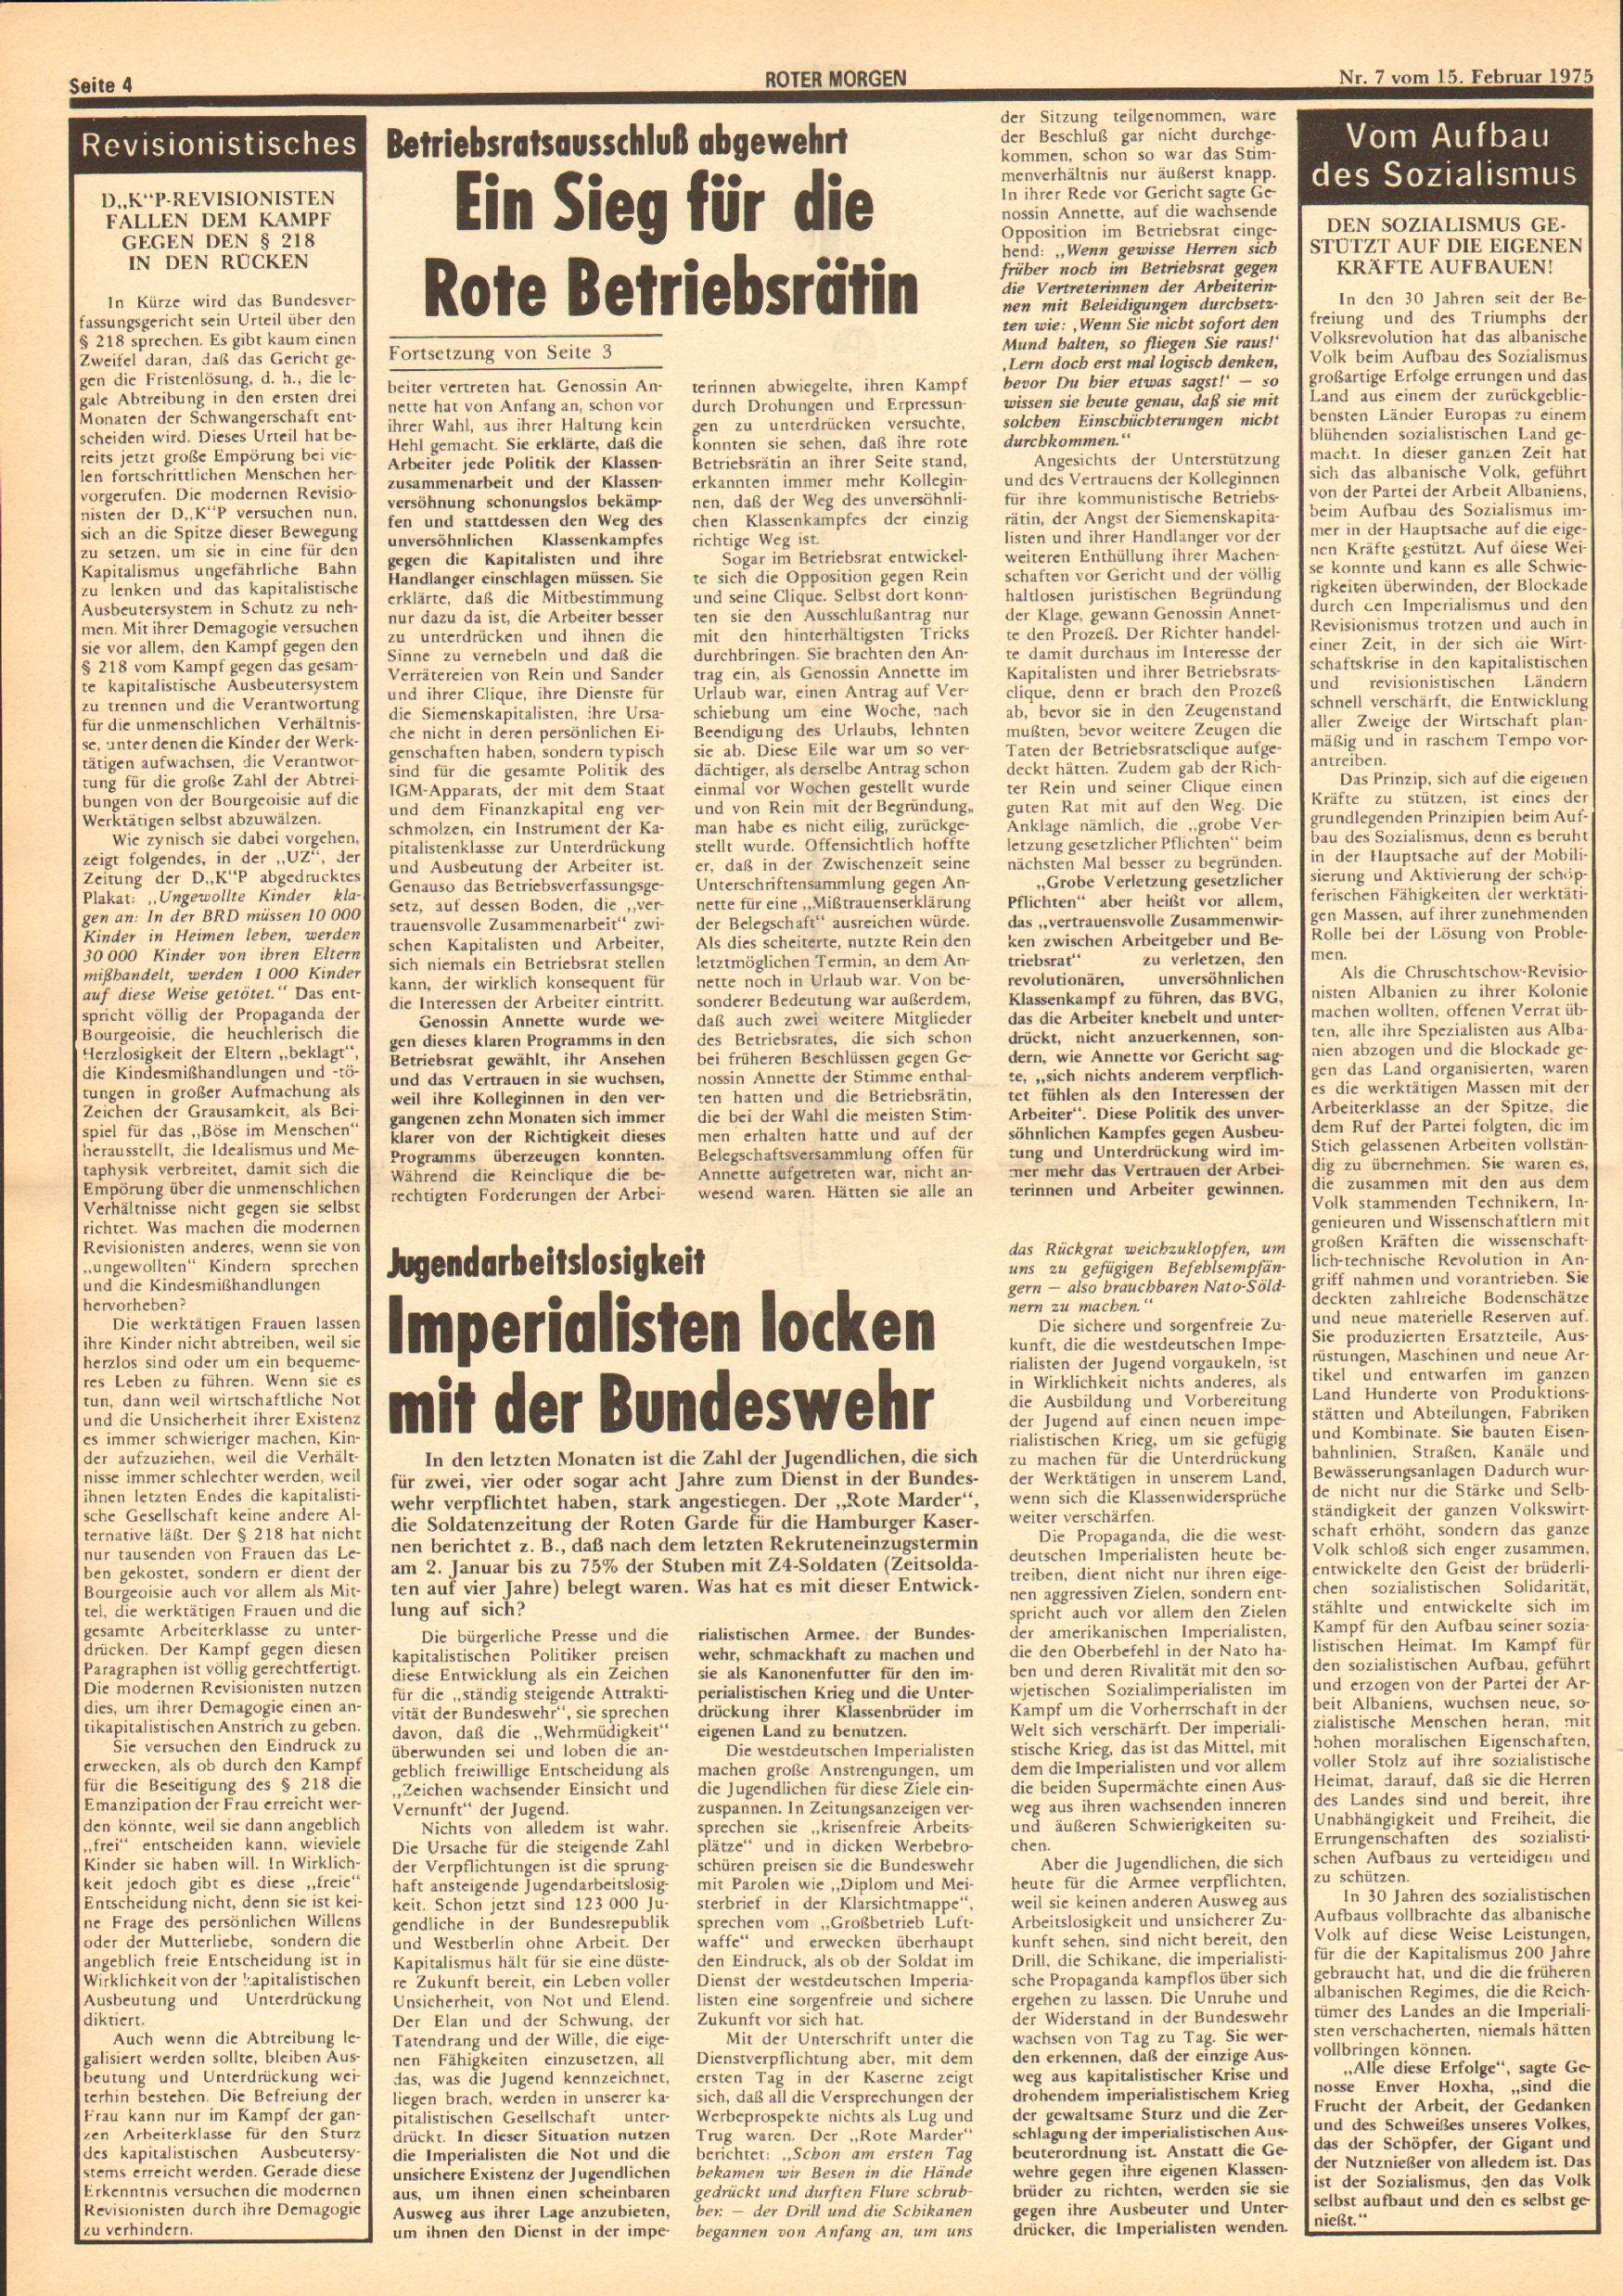 Roter Morgen, 9. Jg., 15. Februar 1975, Nr. 7, Seite 4